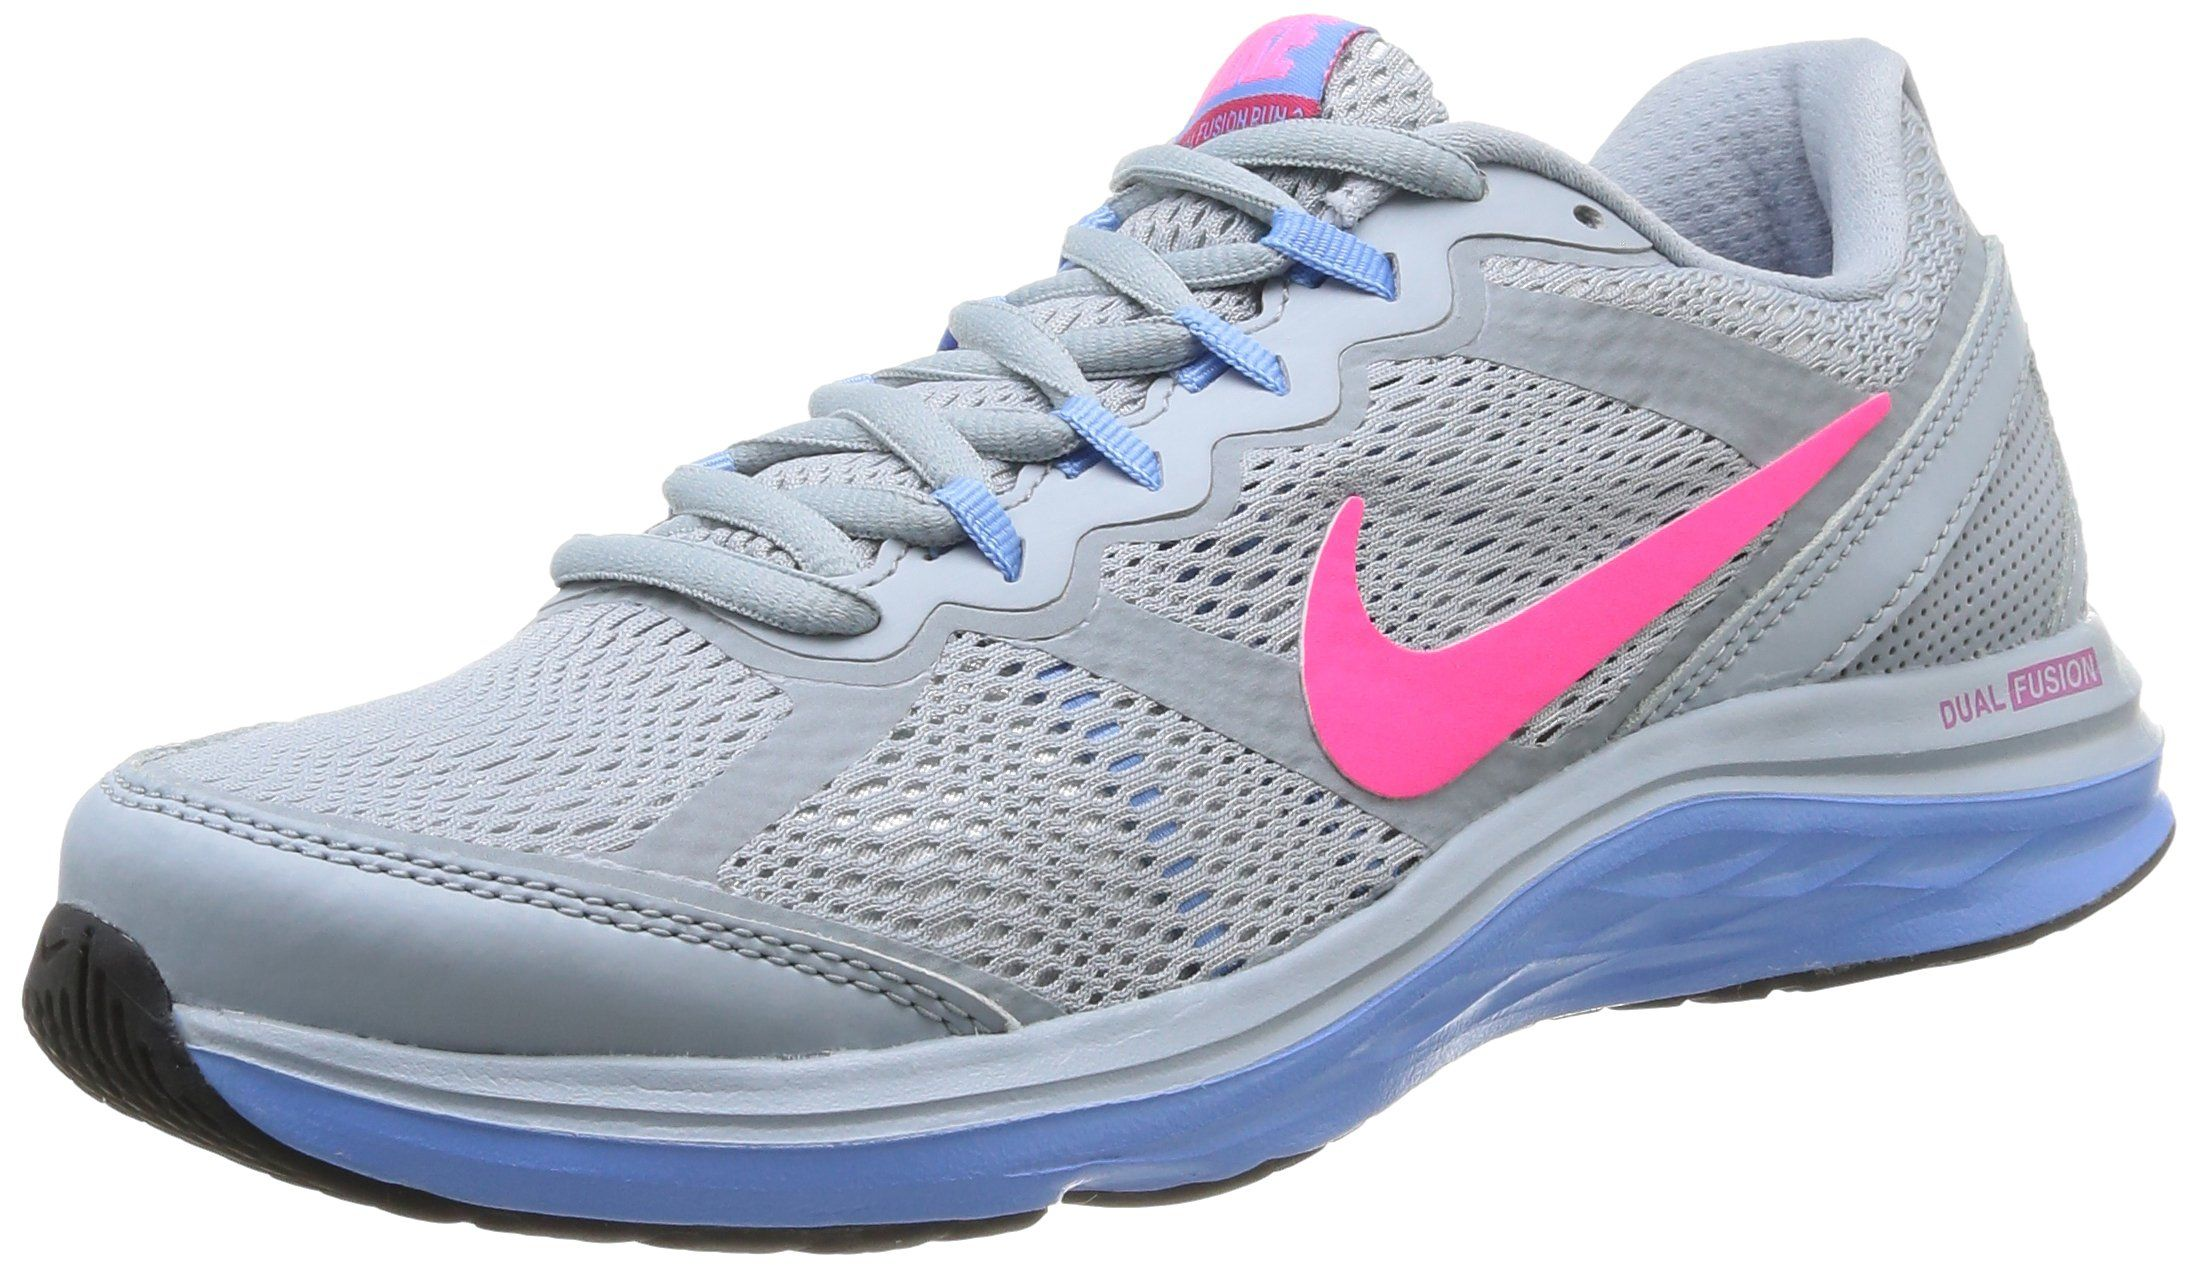 Nike 653594 002 Wmns Dual Fusion Run 3 Damen Sportschuhe - Running  Mehrfarbig (Lt Mgnt Gry/Hypr Pnk-White-Unv)